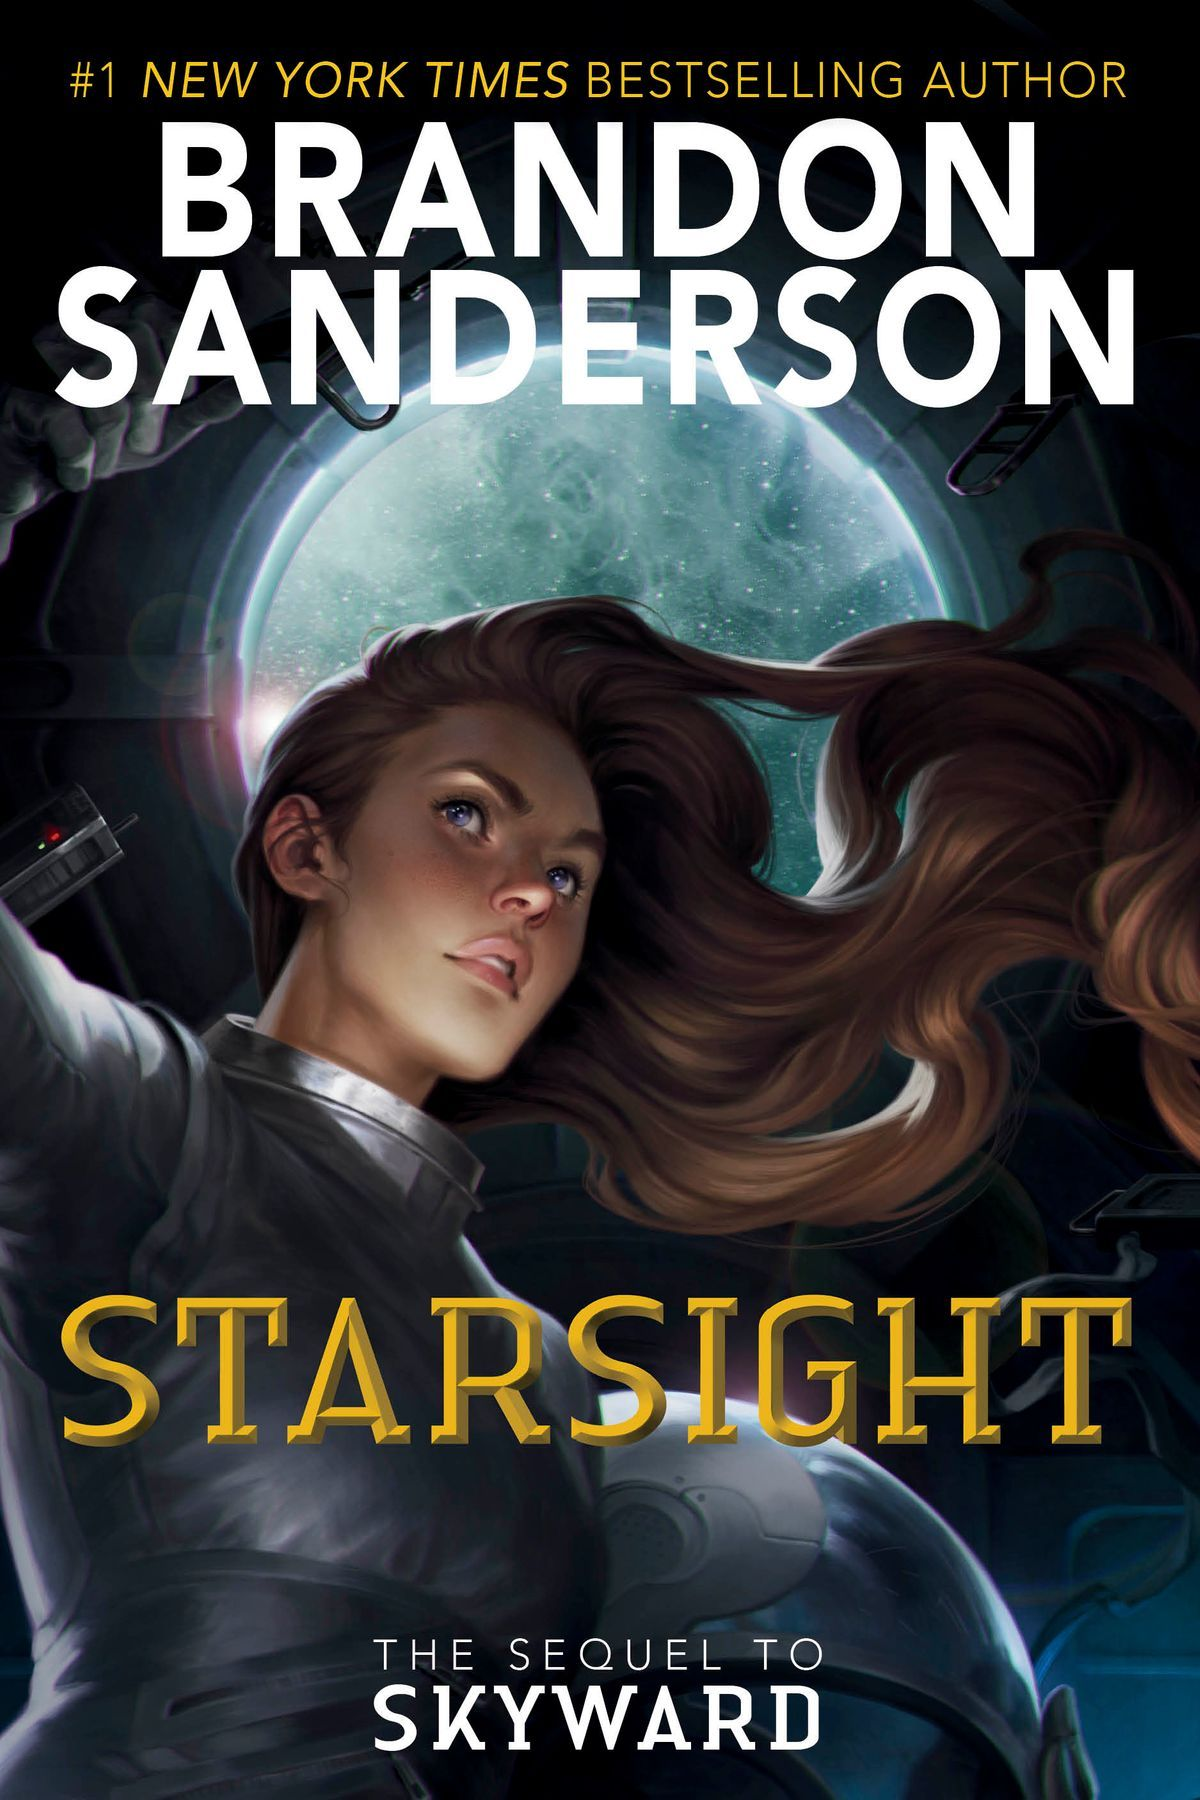 Pdf Free Download Starsight Skyward 2 By Brandon Sanderson